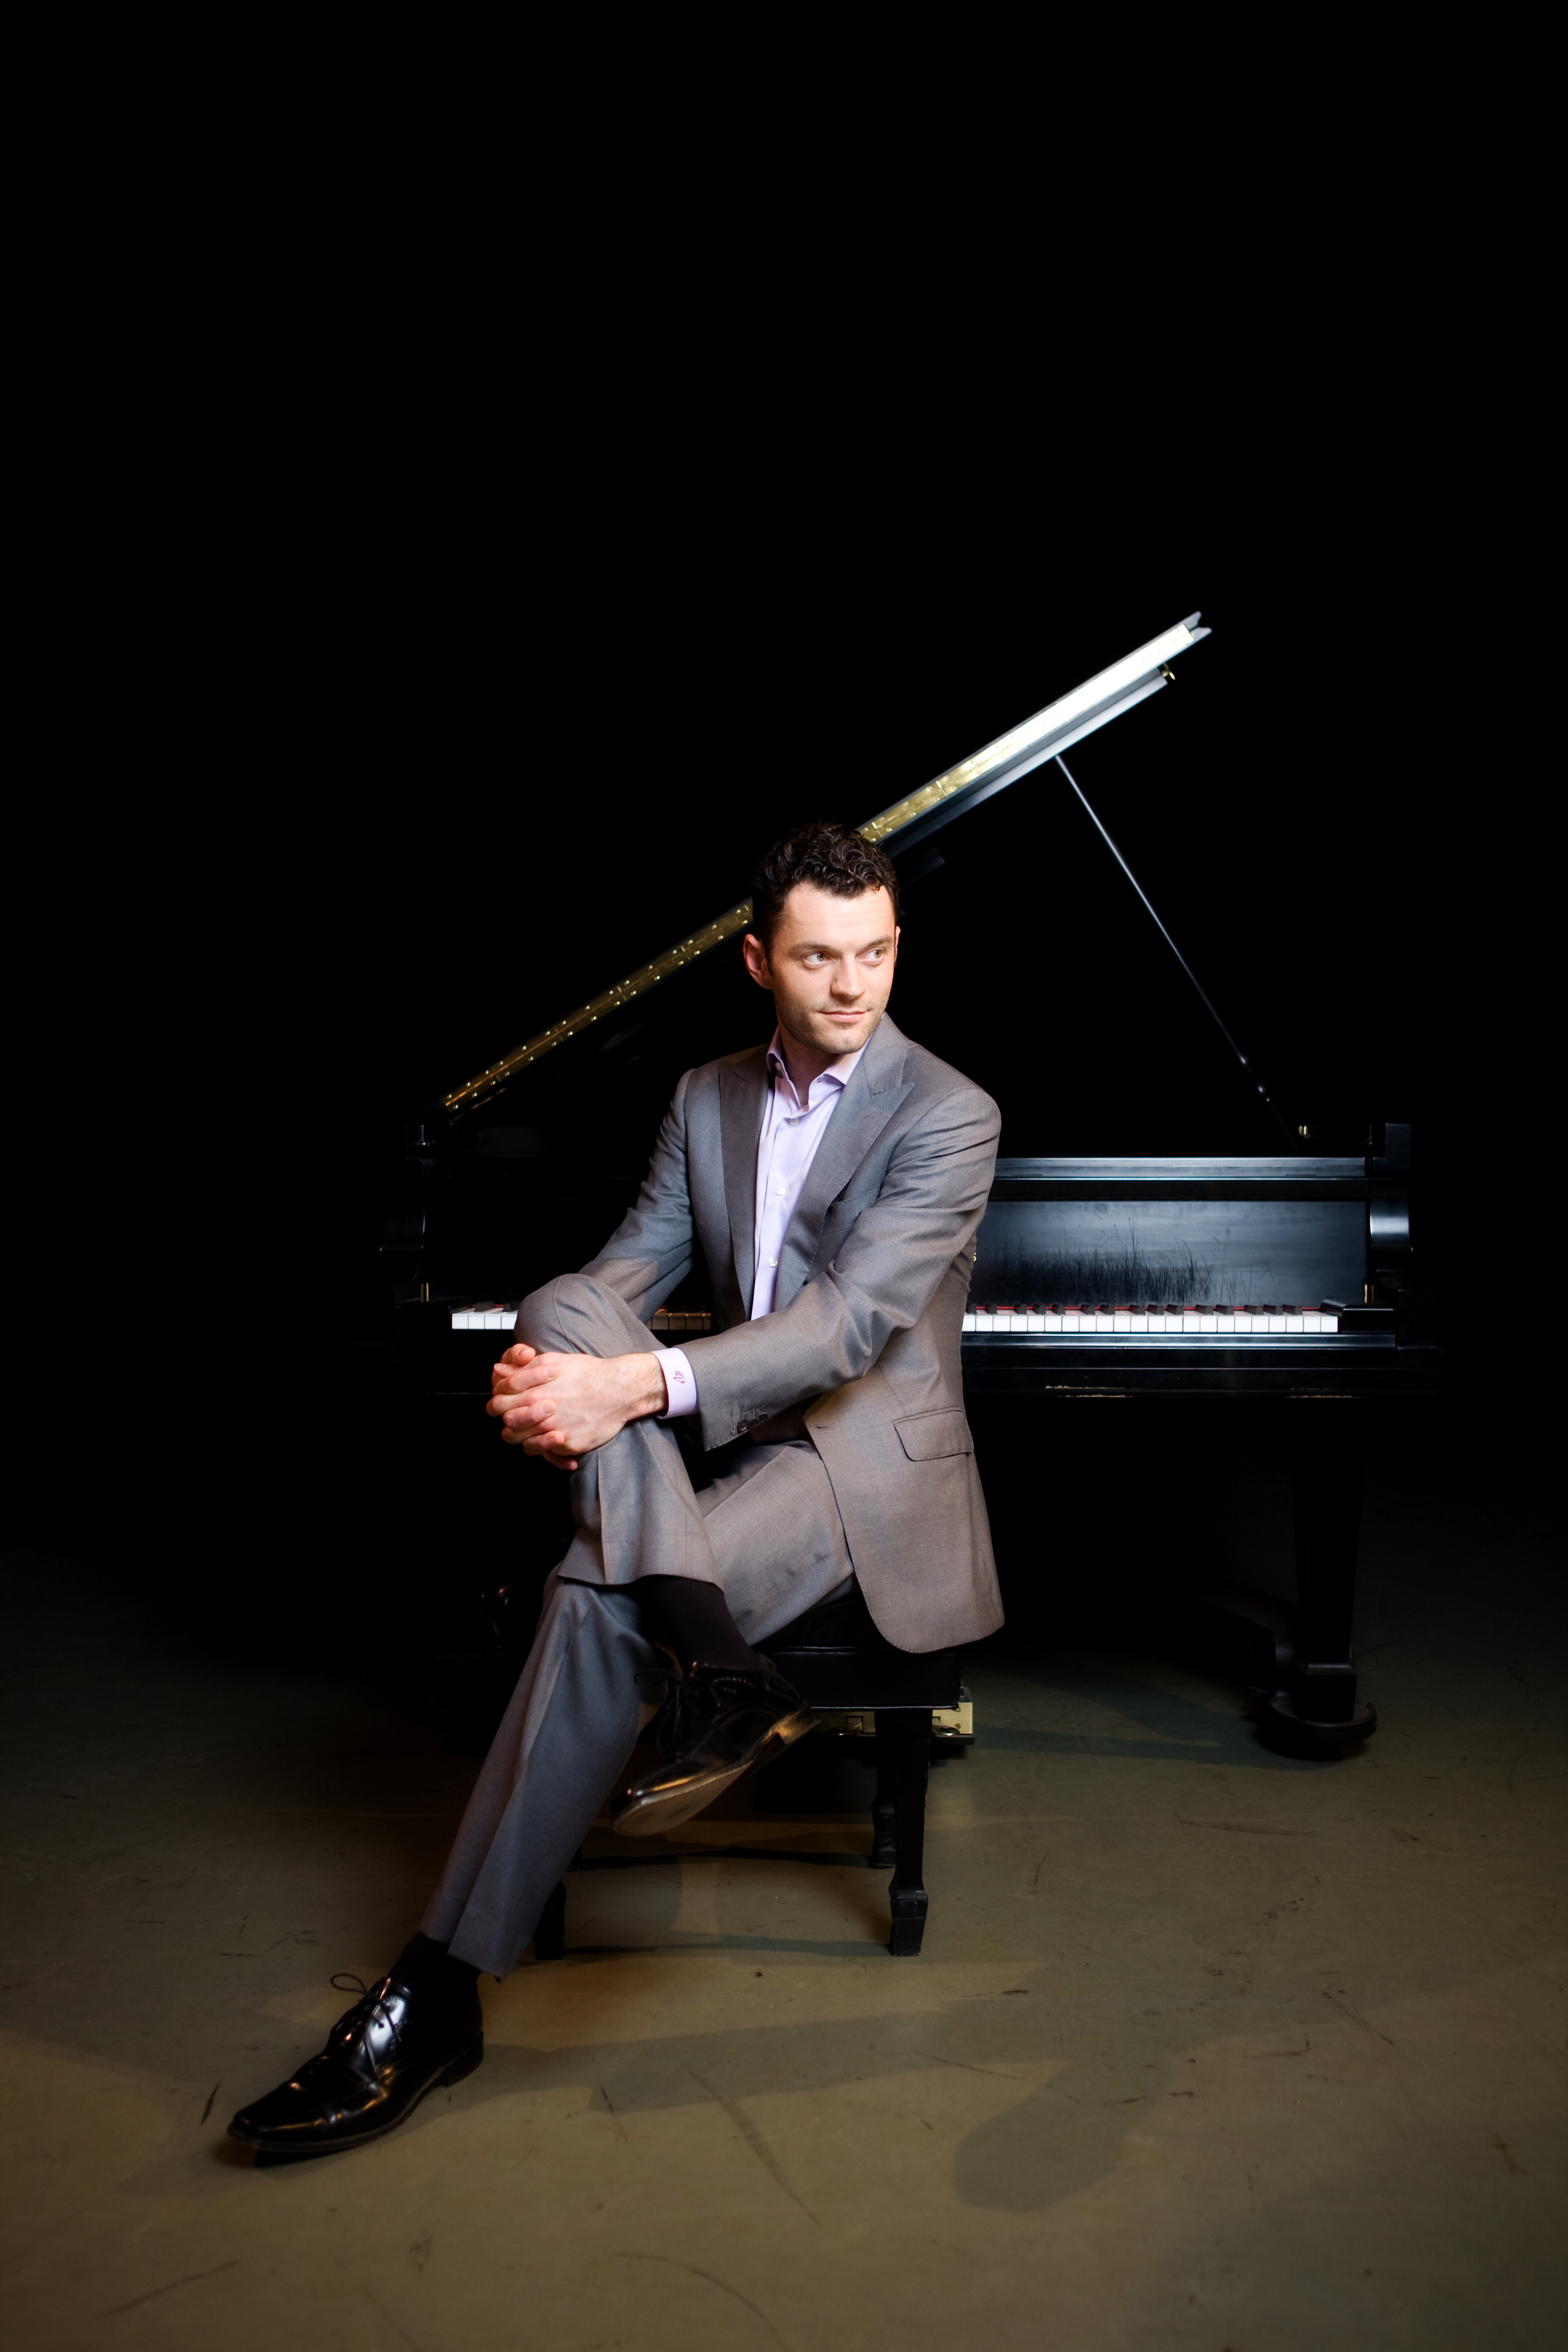 Steven Vanhauwaert, Pianist